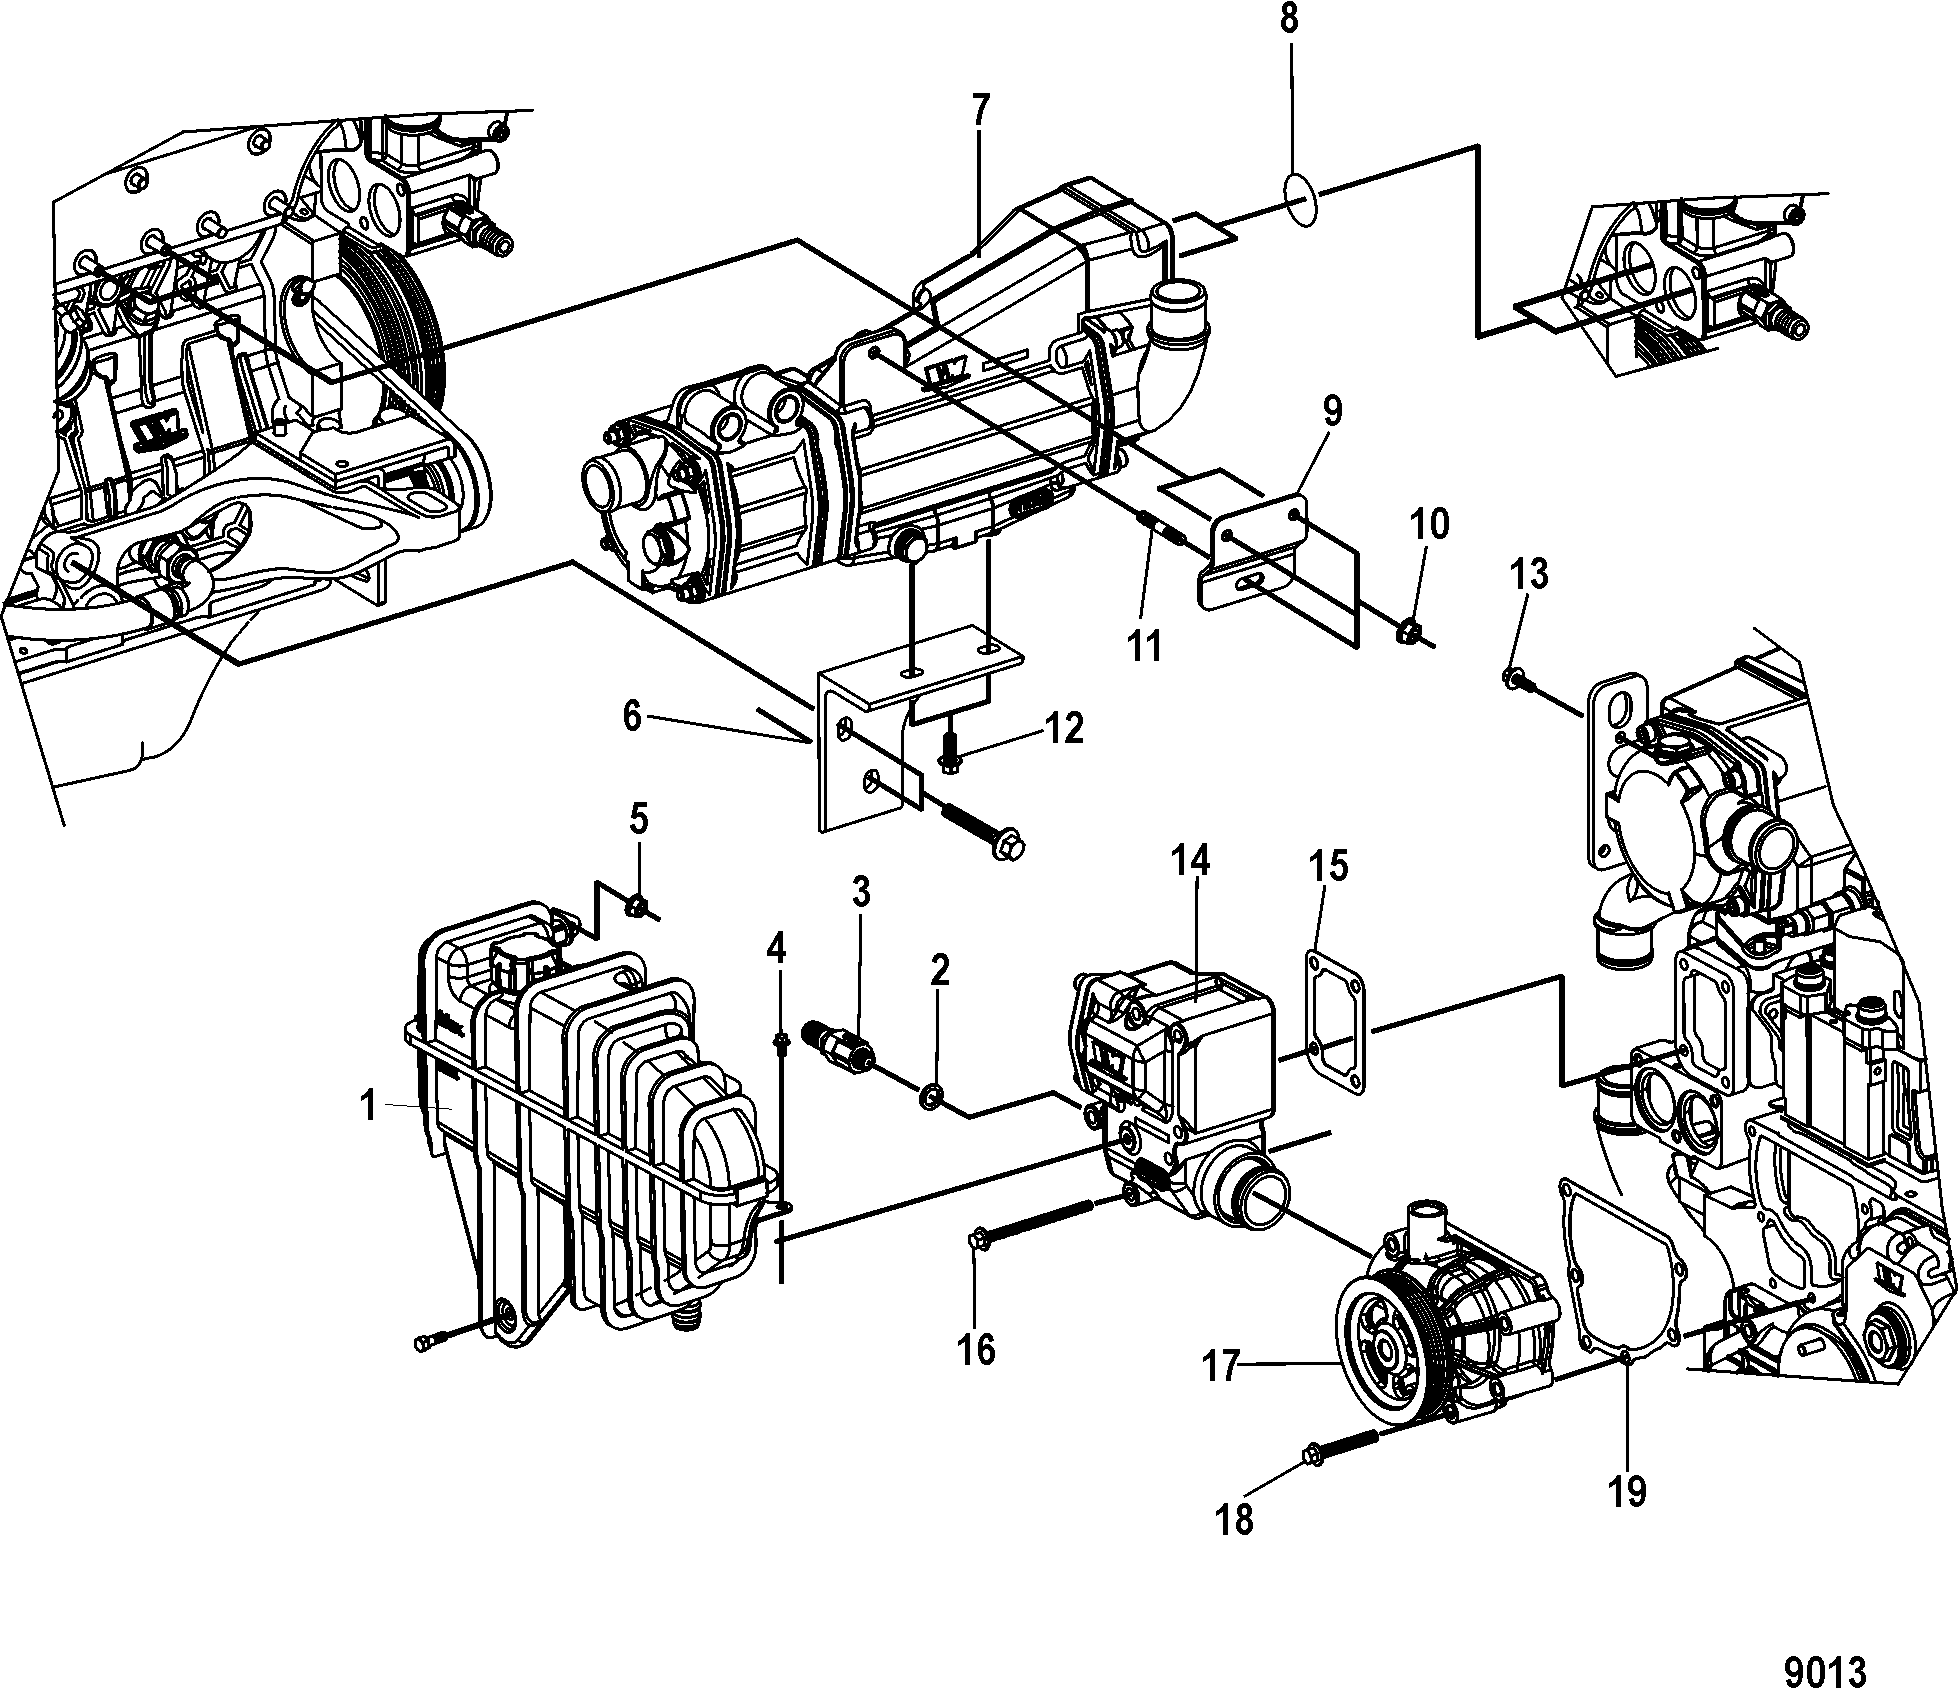 Cooling System ponents FOR MERCRUISER MIE CUMMINS MERCRUISER